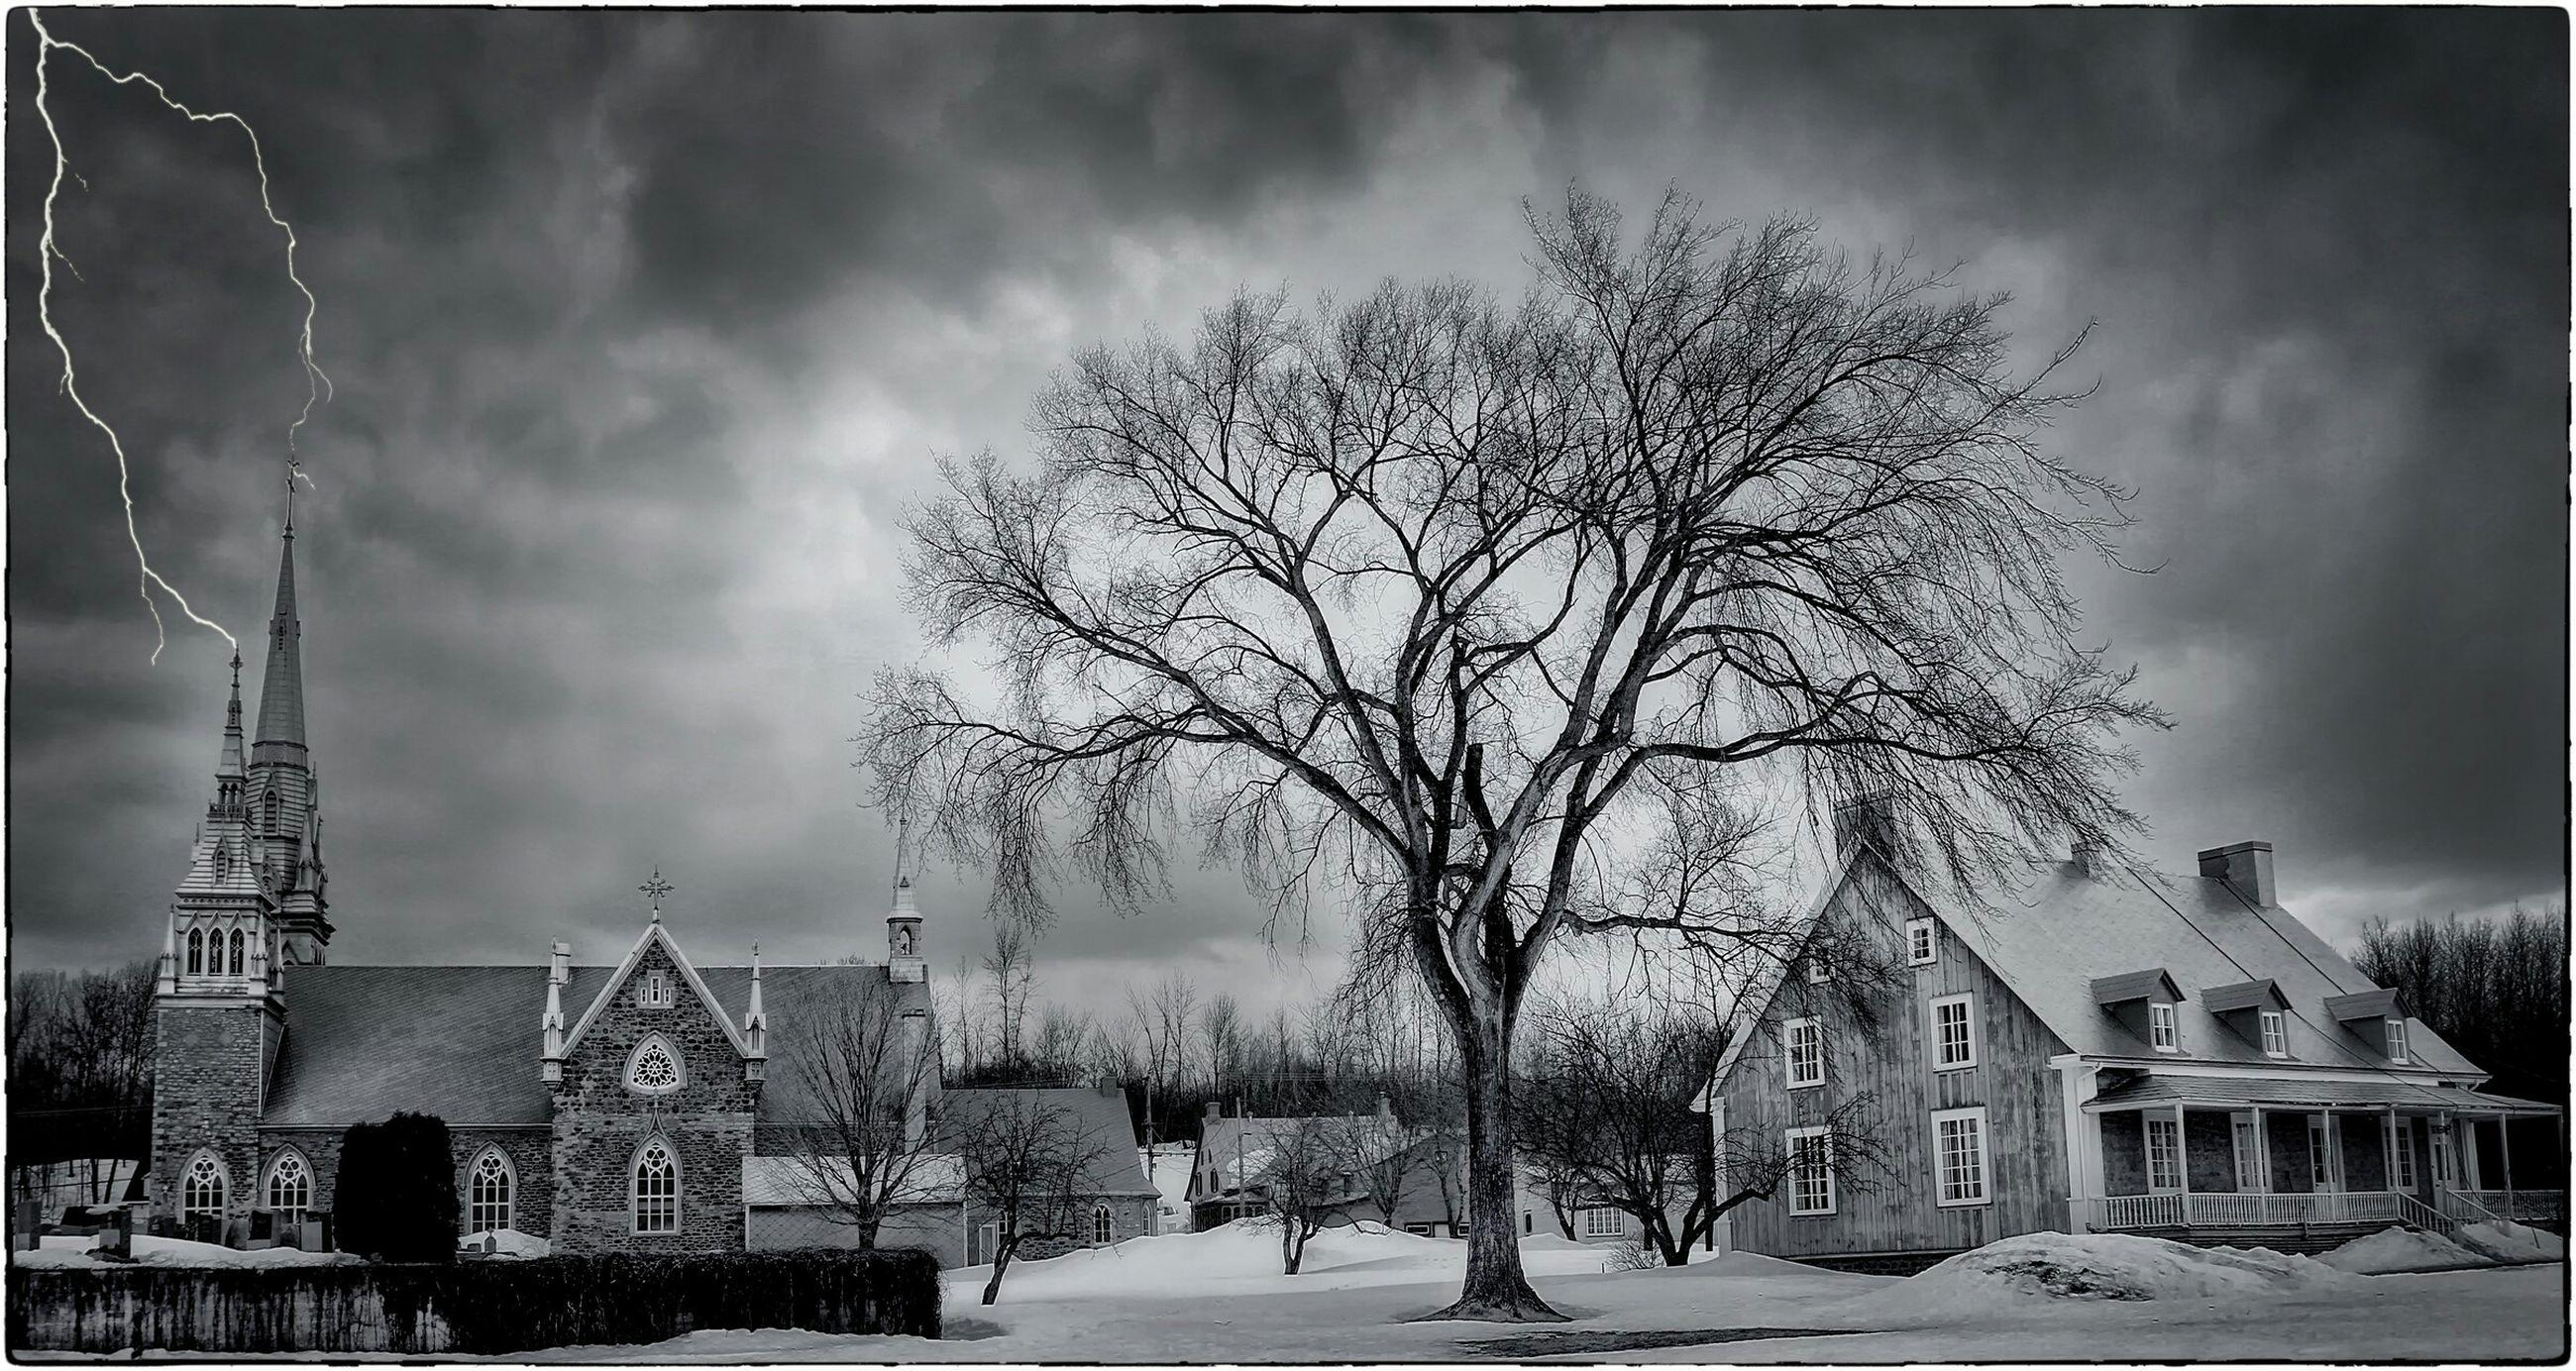 building exterior, architecture, built structure, sky, tree, bare tree, cloud - sky, city, cloudy, silhouette, cloud, city life, incidental people, building, weather, outdoors, dusk, men, travel destinations